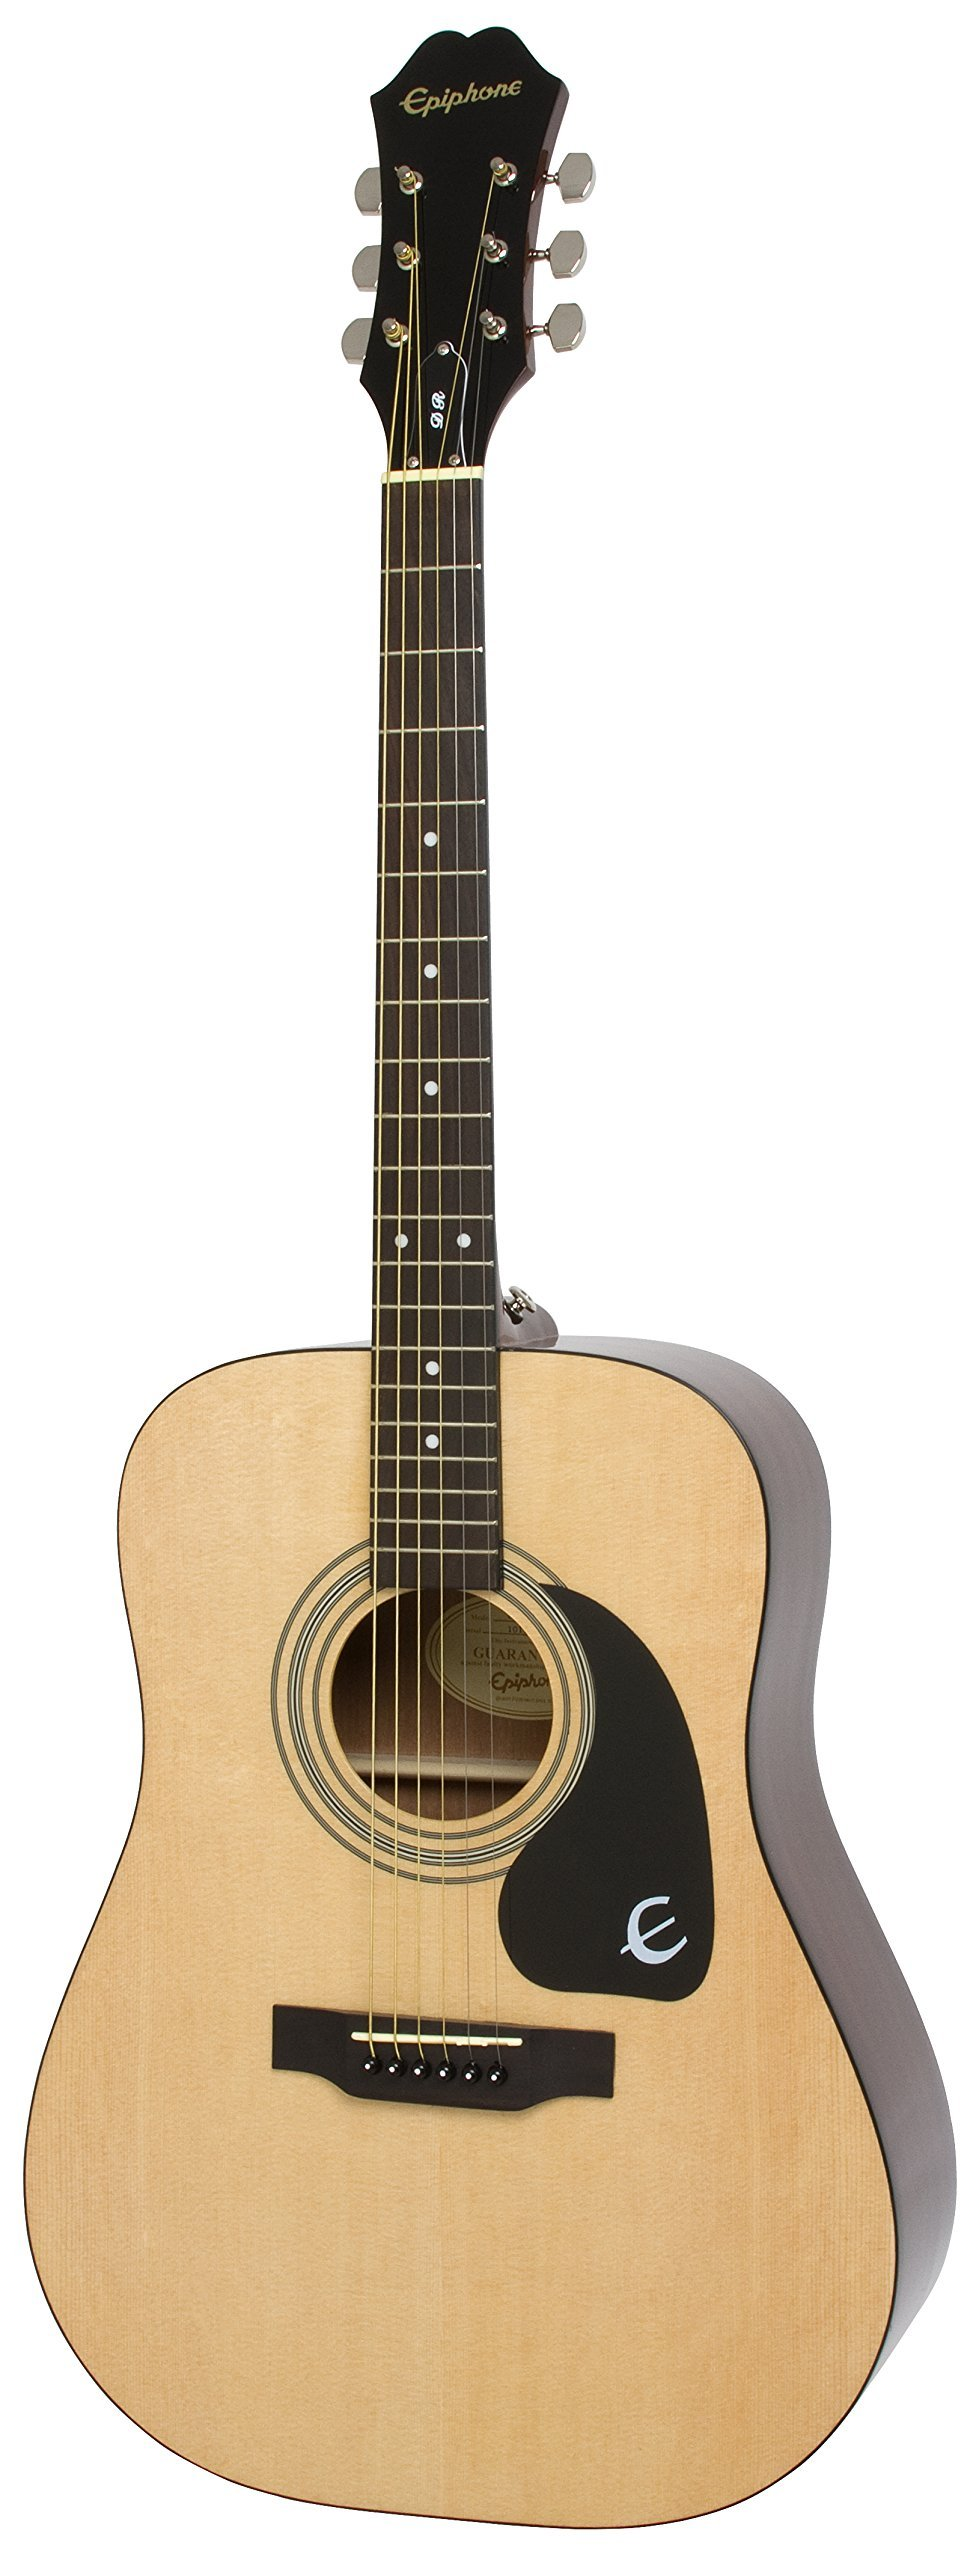 Epiphone DR-100 - Guitarras acústicas con cuerdas metálicas, color natural